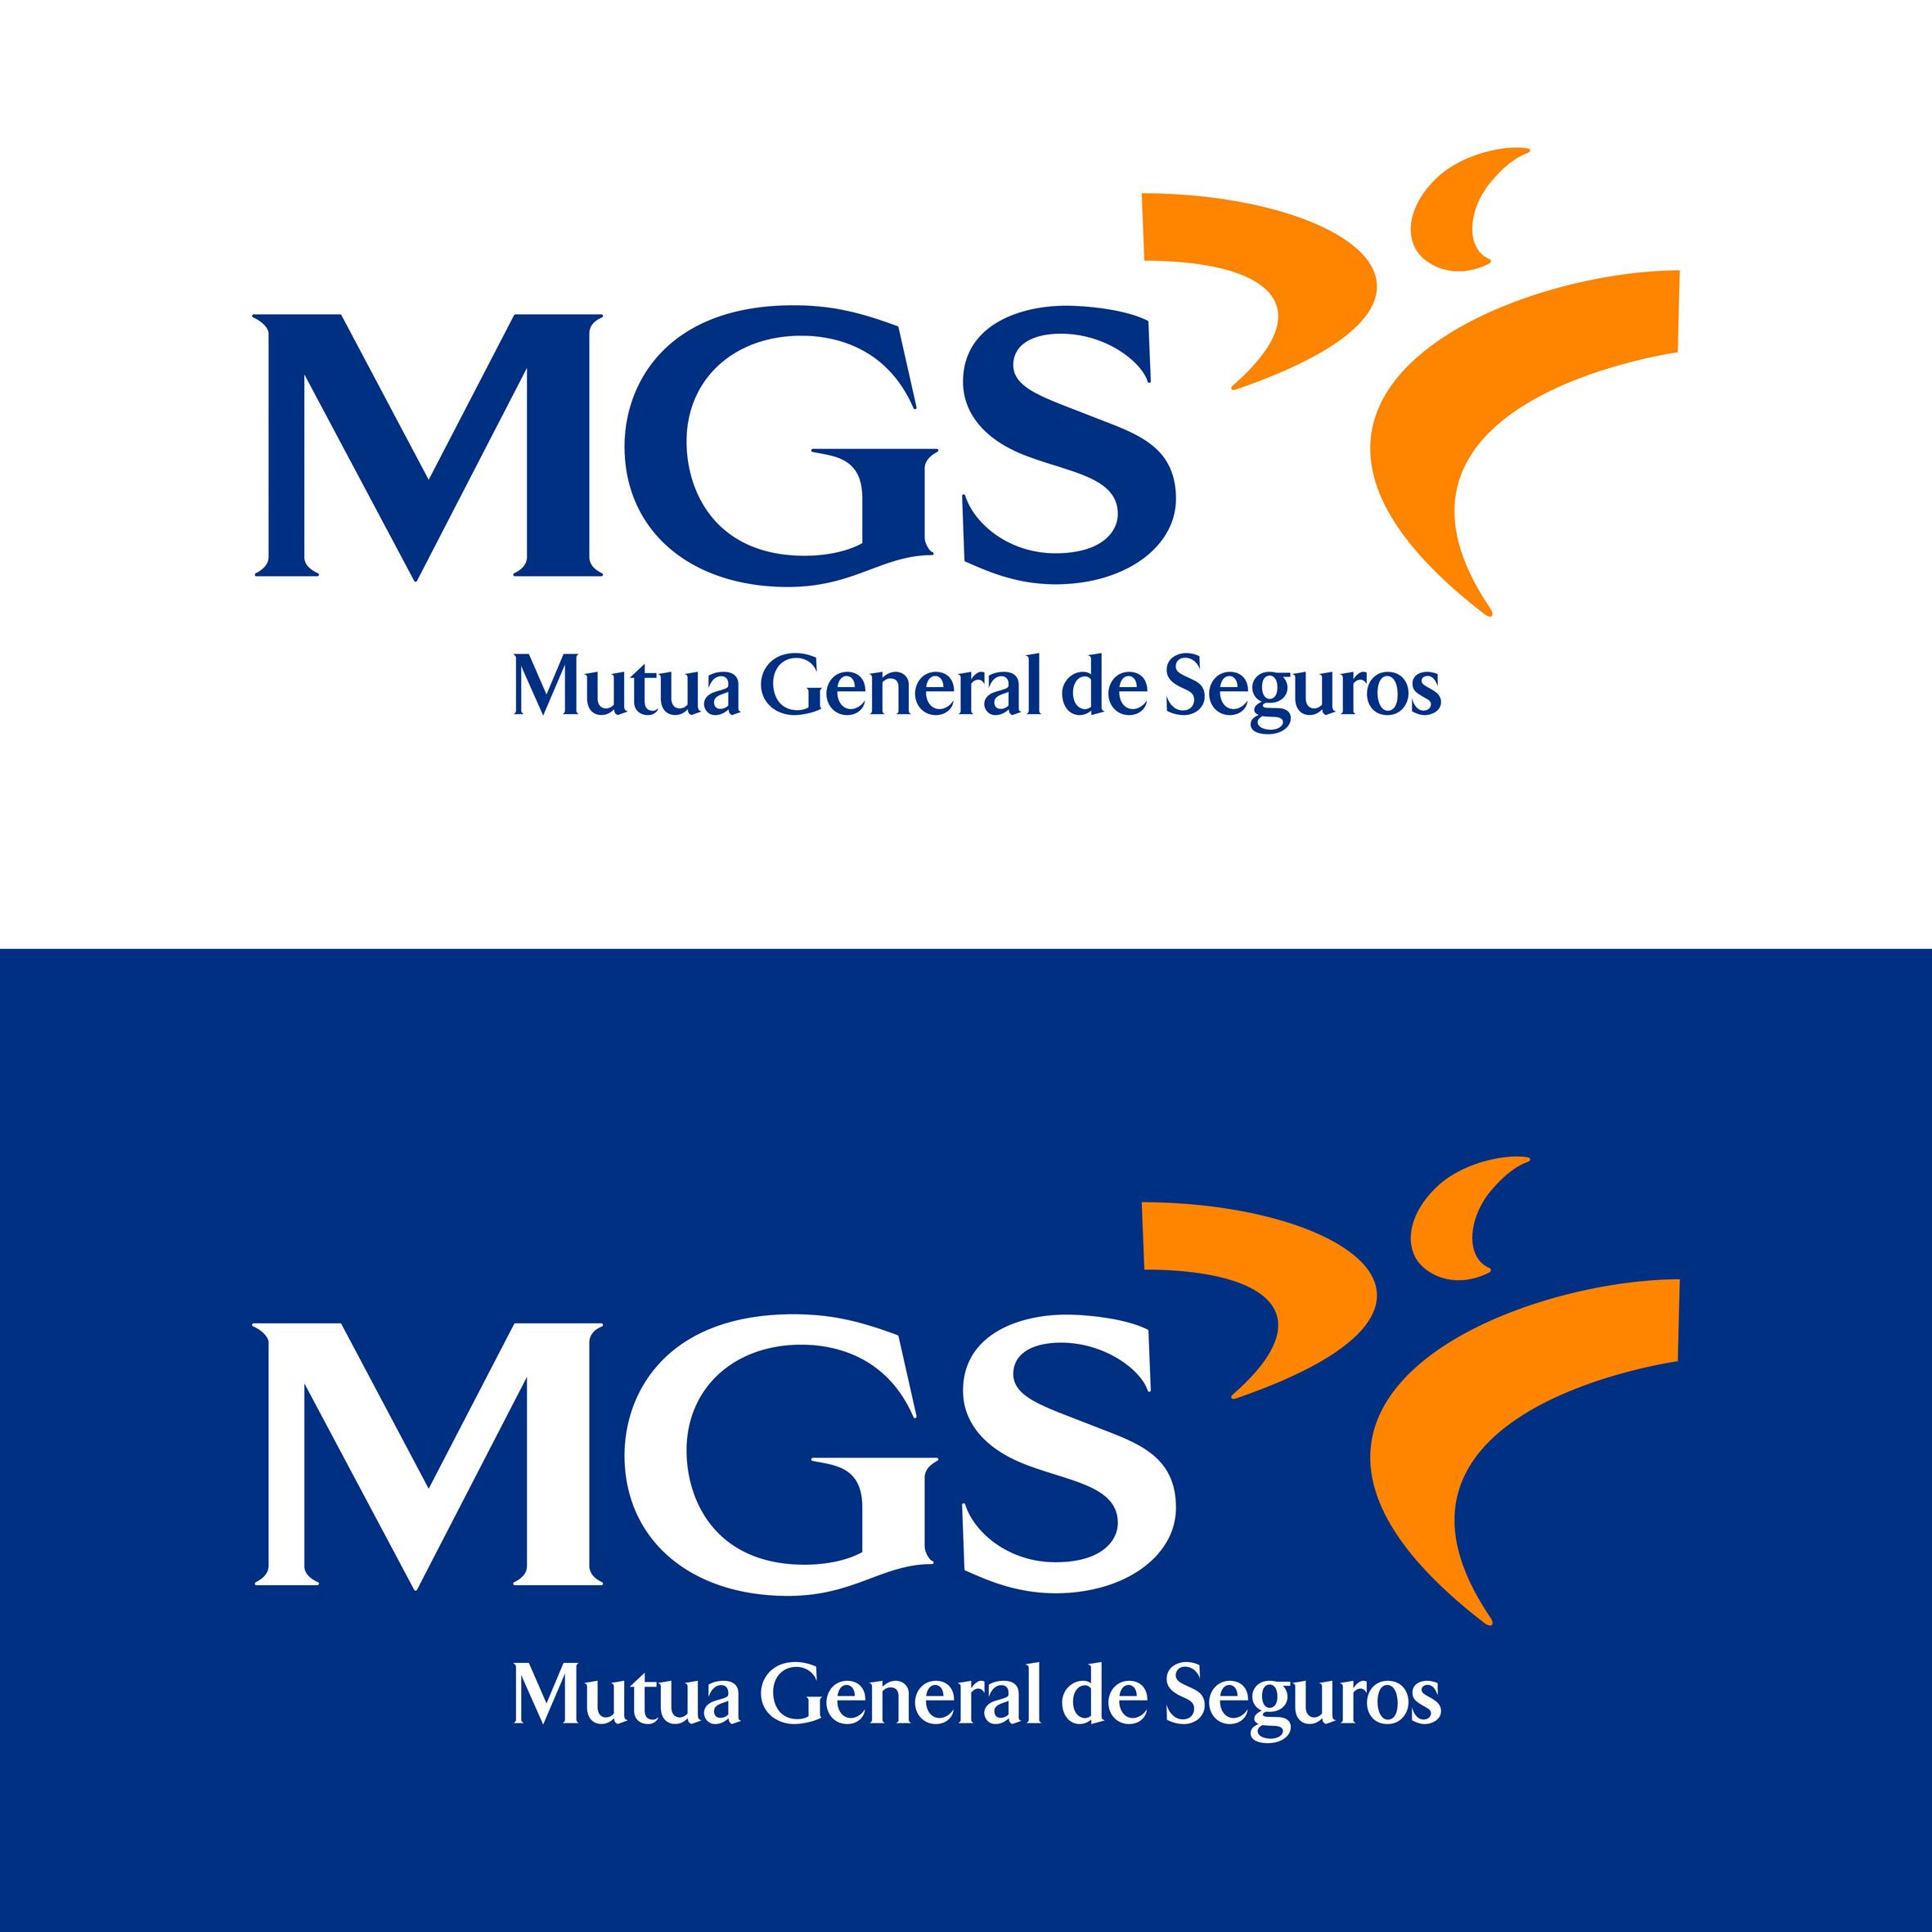 http://www.avalanche.es/ava_ava/presskit/256/mgs_logo_pos_neg.jpg